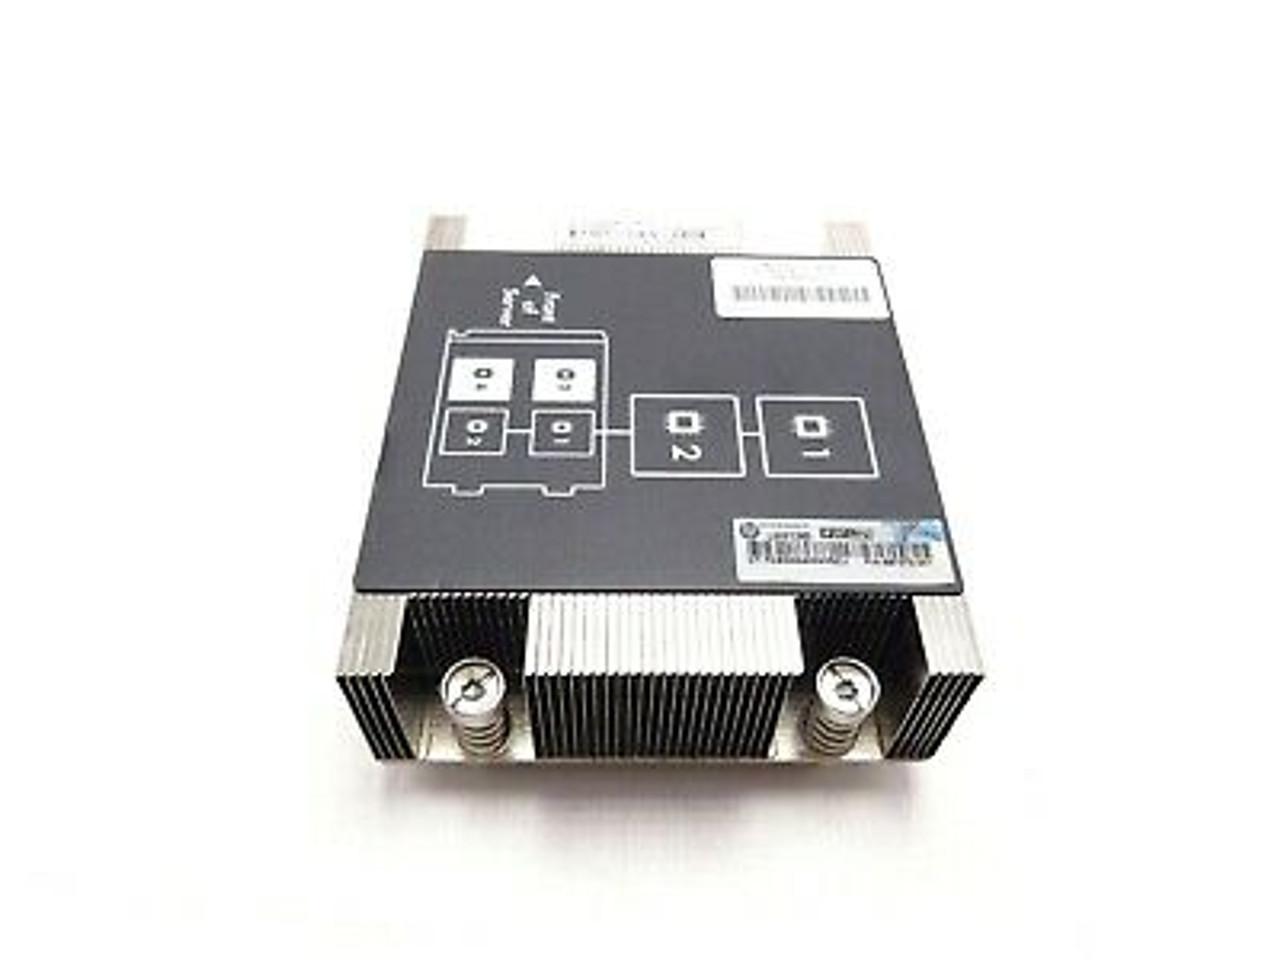 HP 689143-001 BL660C G8 Heatsink Processor 1 and 2